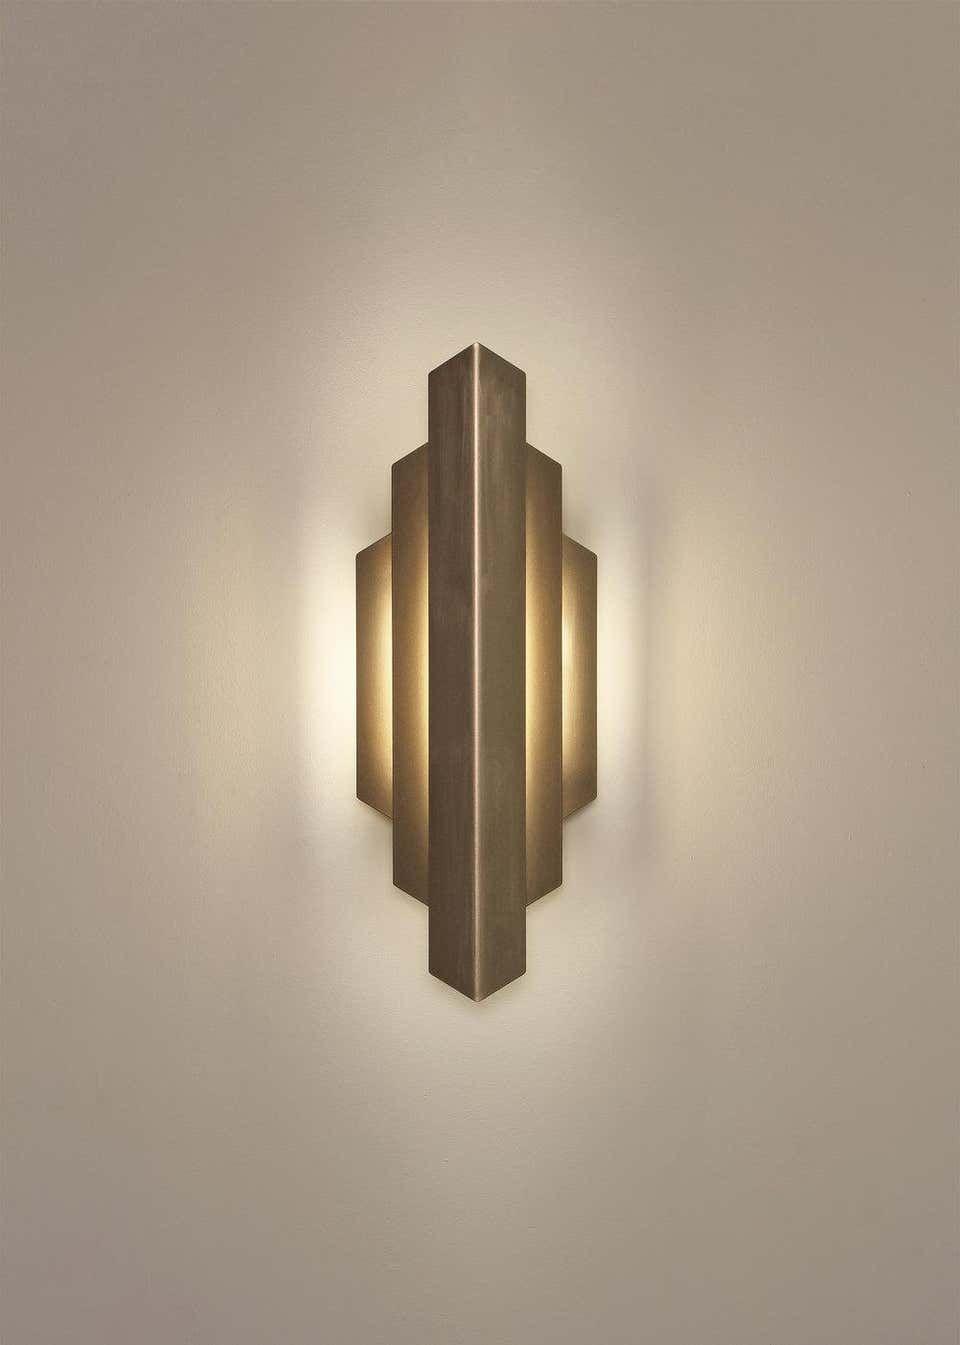 Single Gold Wall Lamp Eichholtz Claridges In 2021 Art Deco Wall Lights Wall Lamp Art Deco Lamps